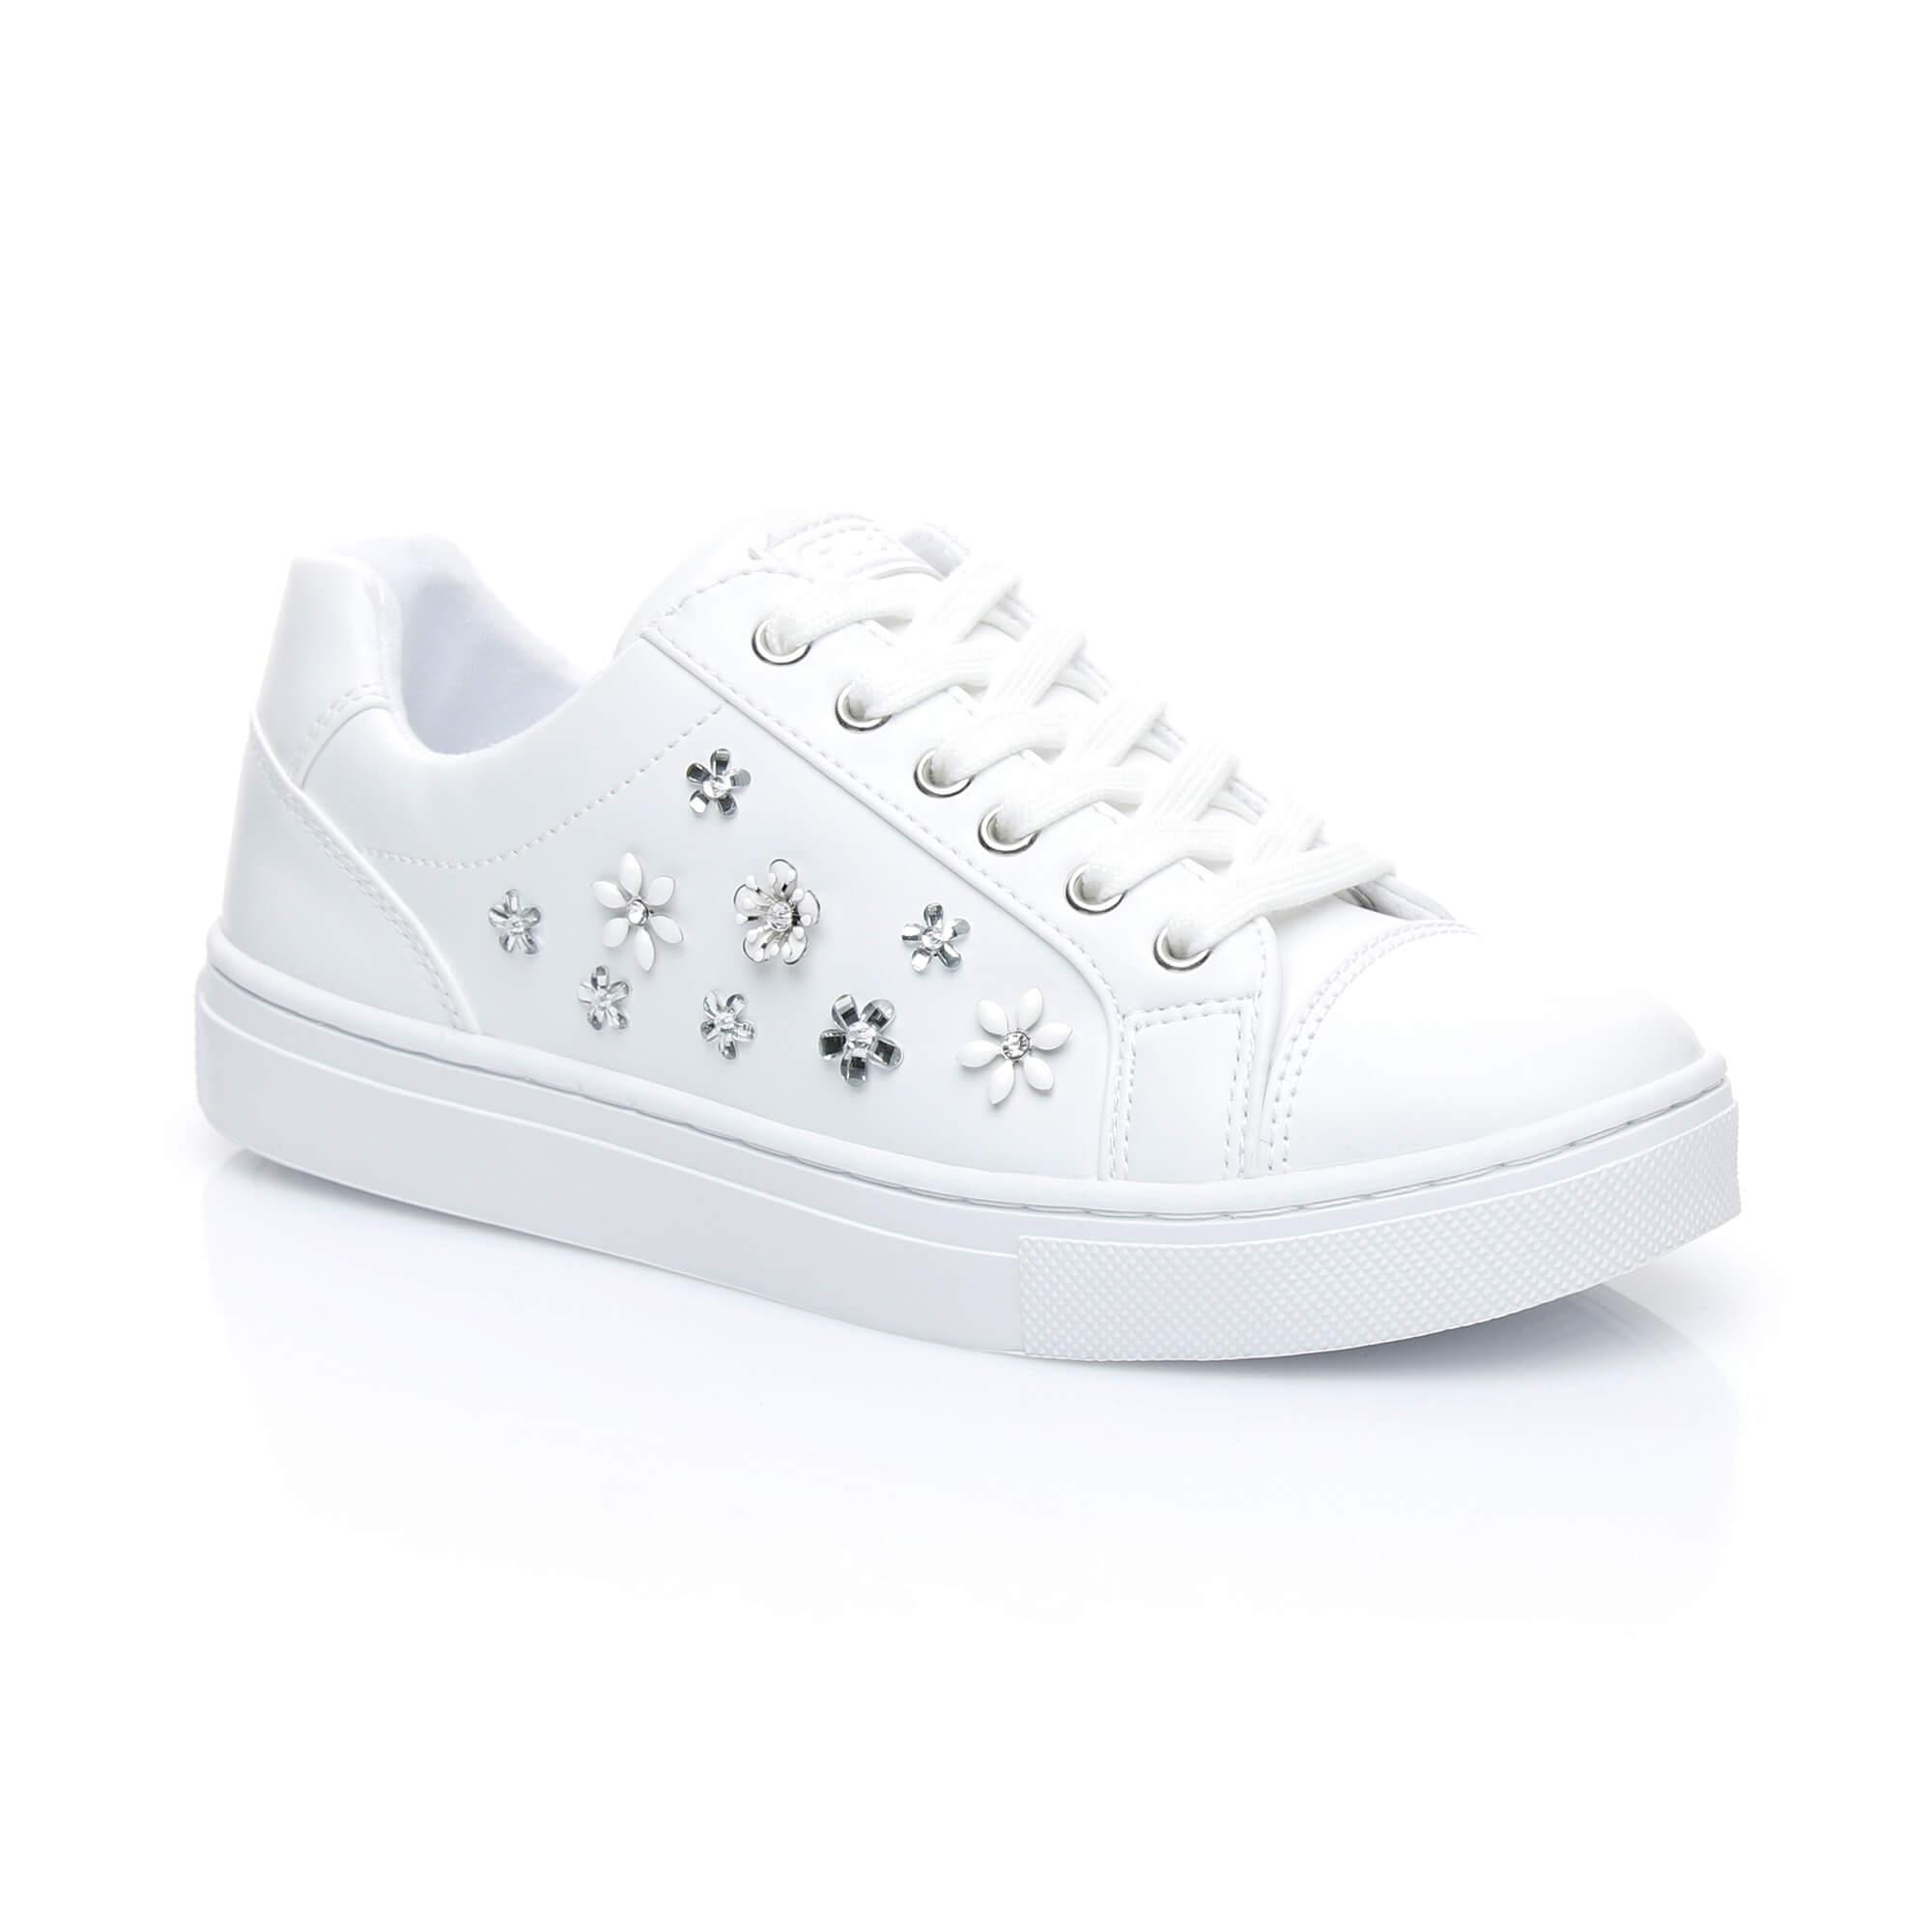 Guess Jamıt Kadın Beyaz Sneakers